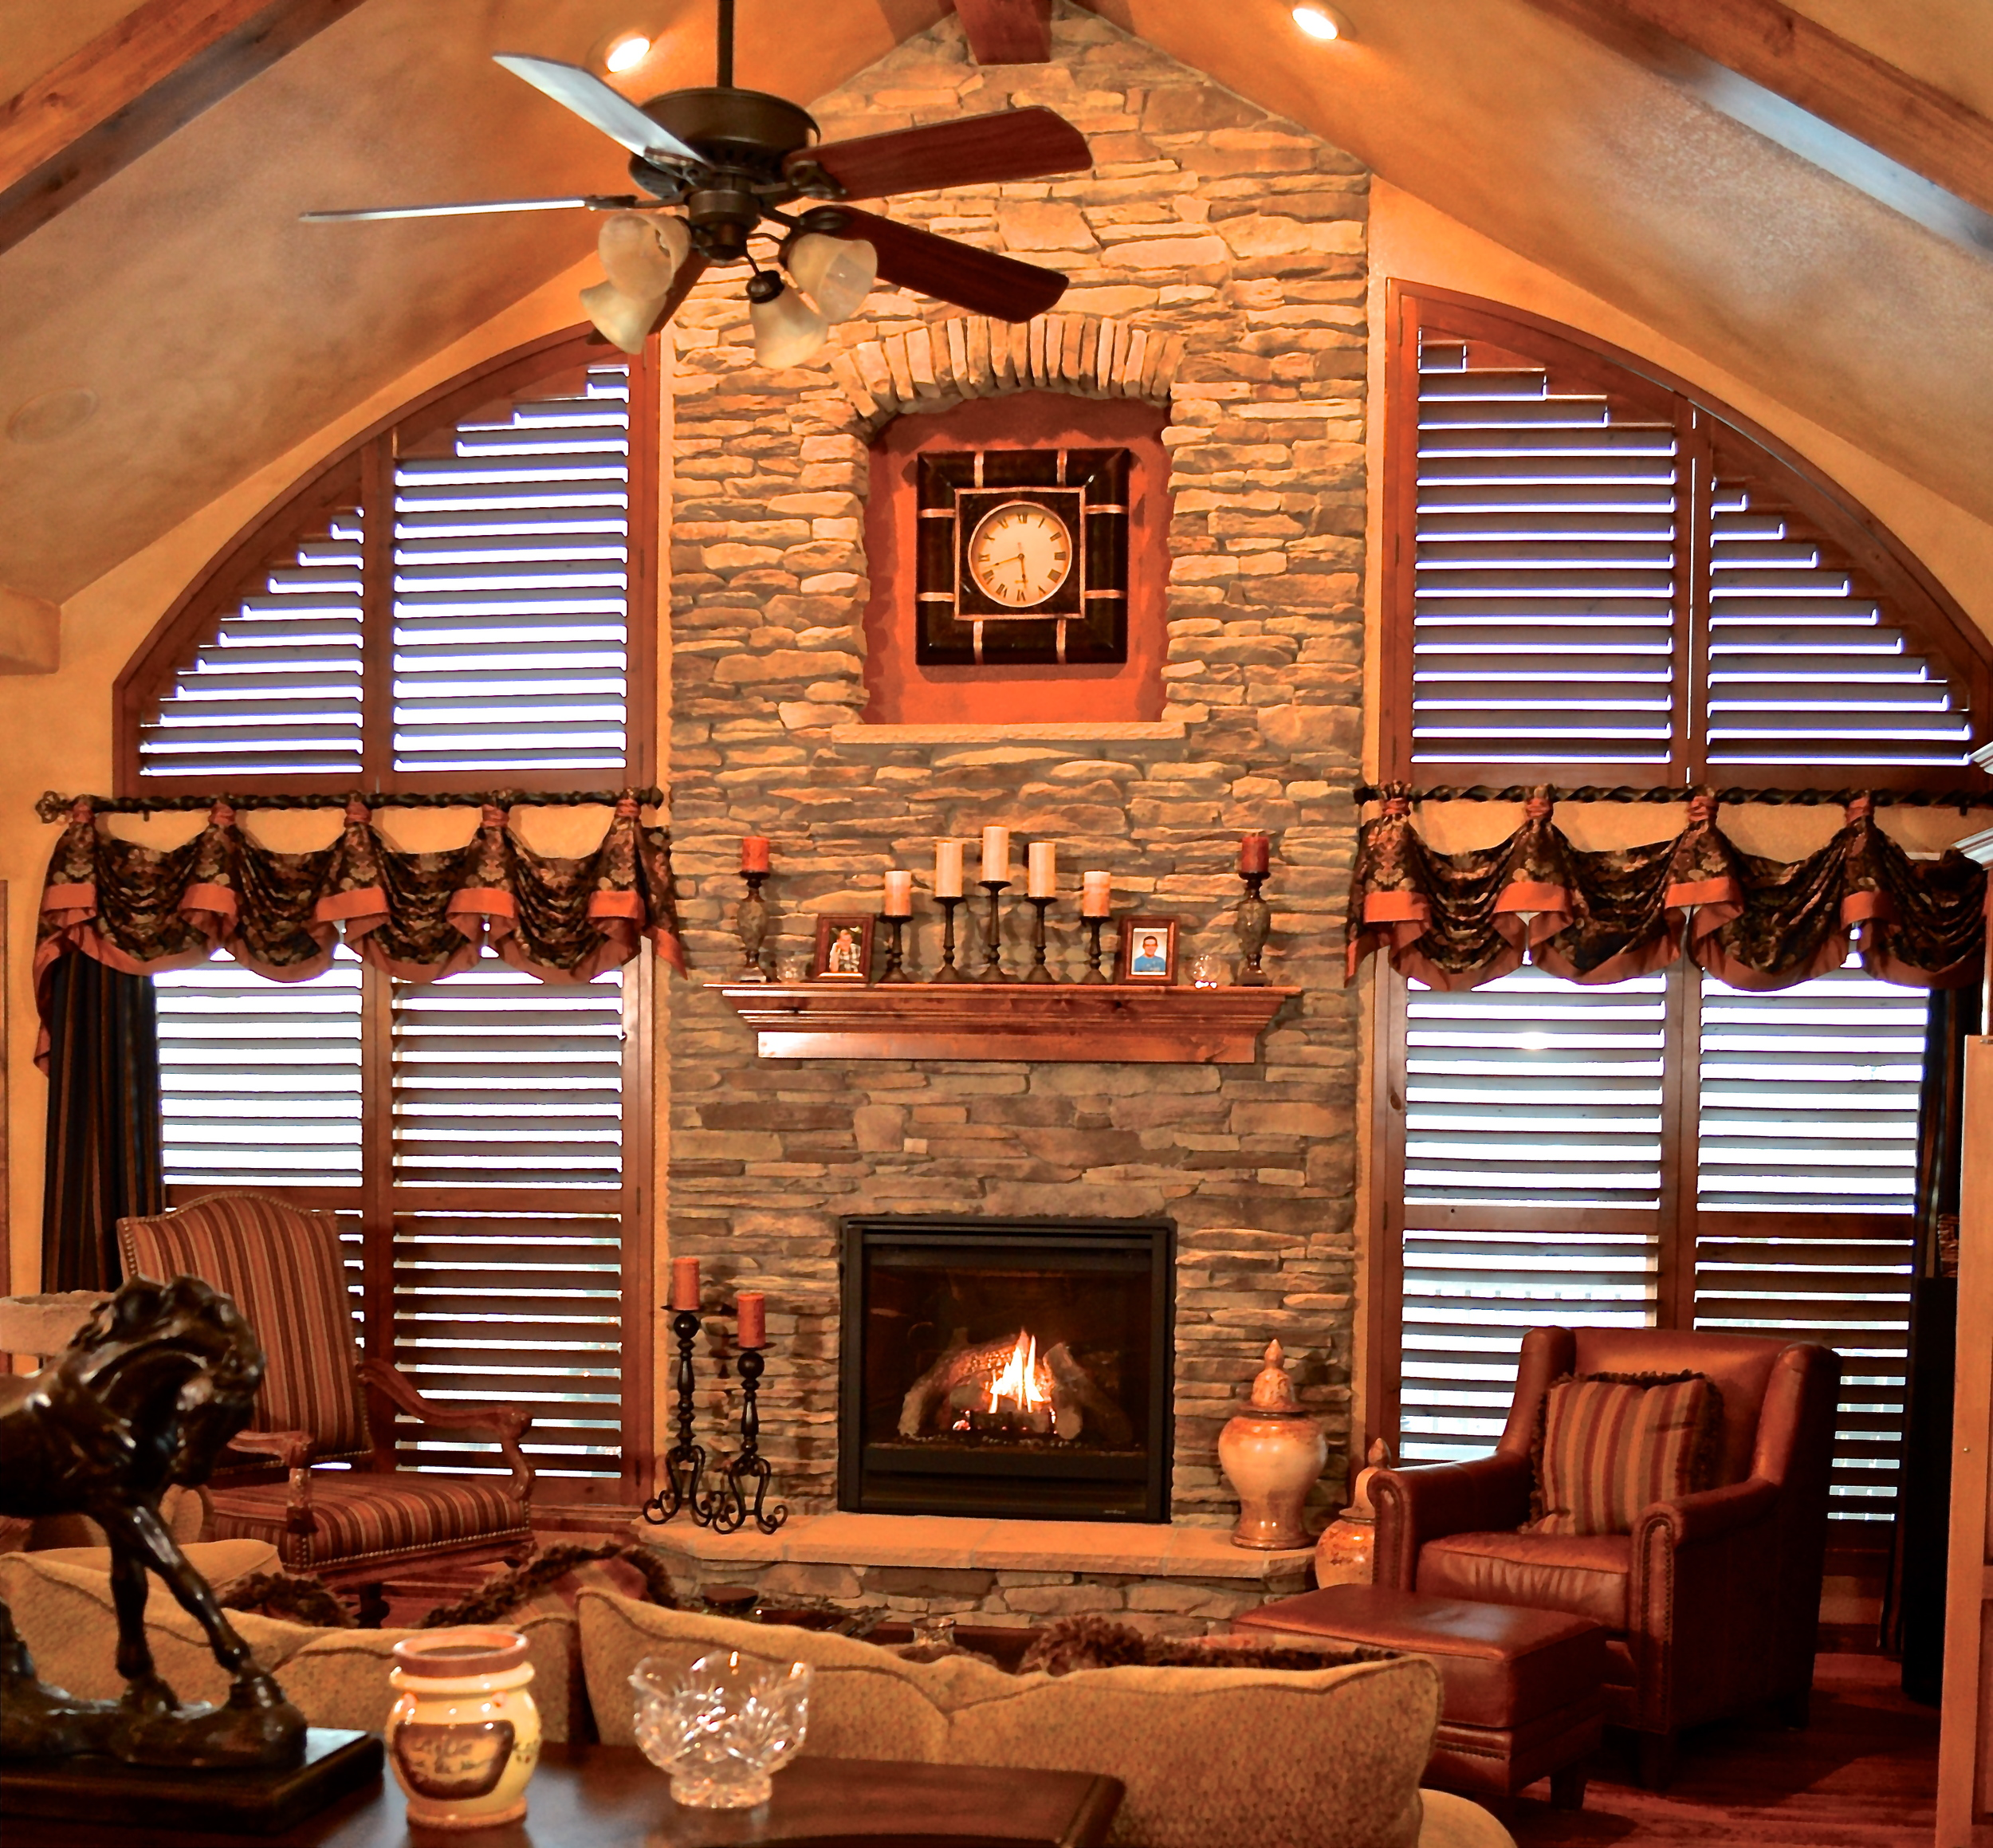 custom home custom drapery interior designer colorado springs nj custom homes builder contractor kevo developement designs